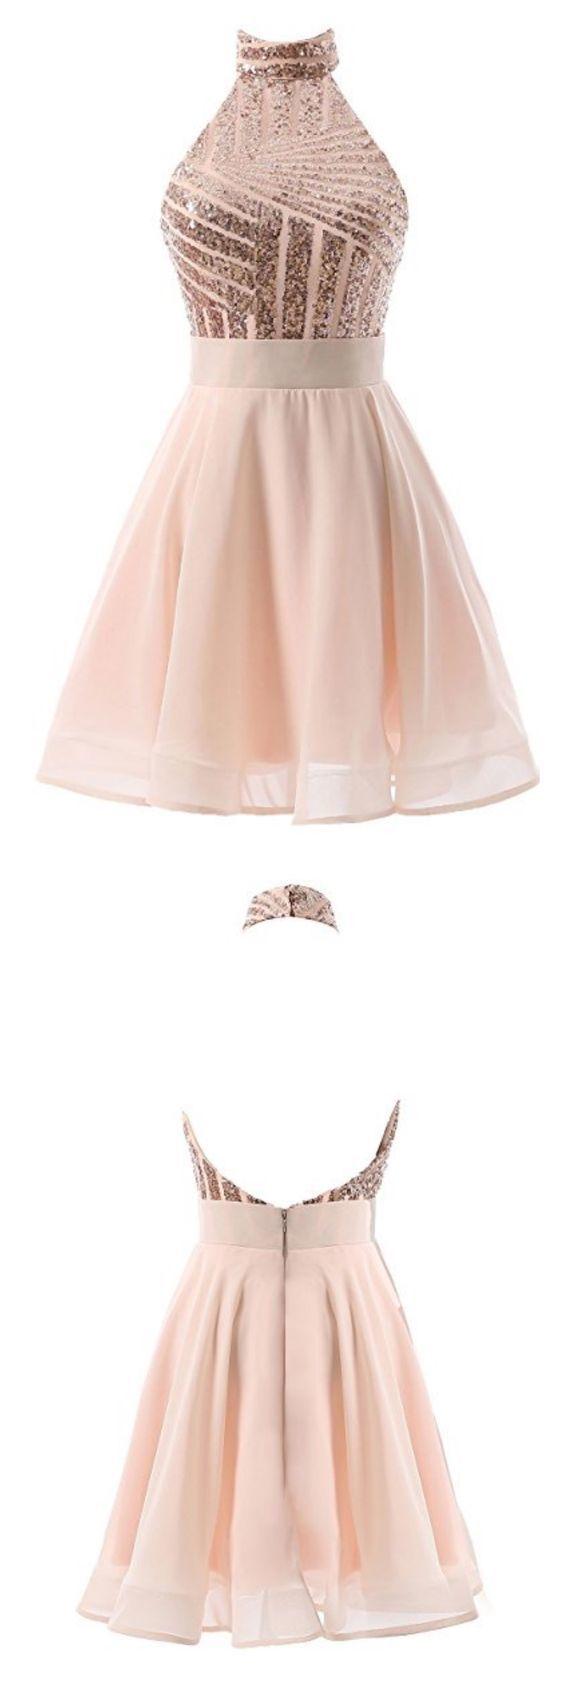 Backless Short Prom Dress, Sexy Halter Prom Dresses